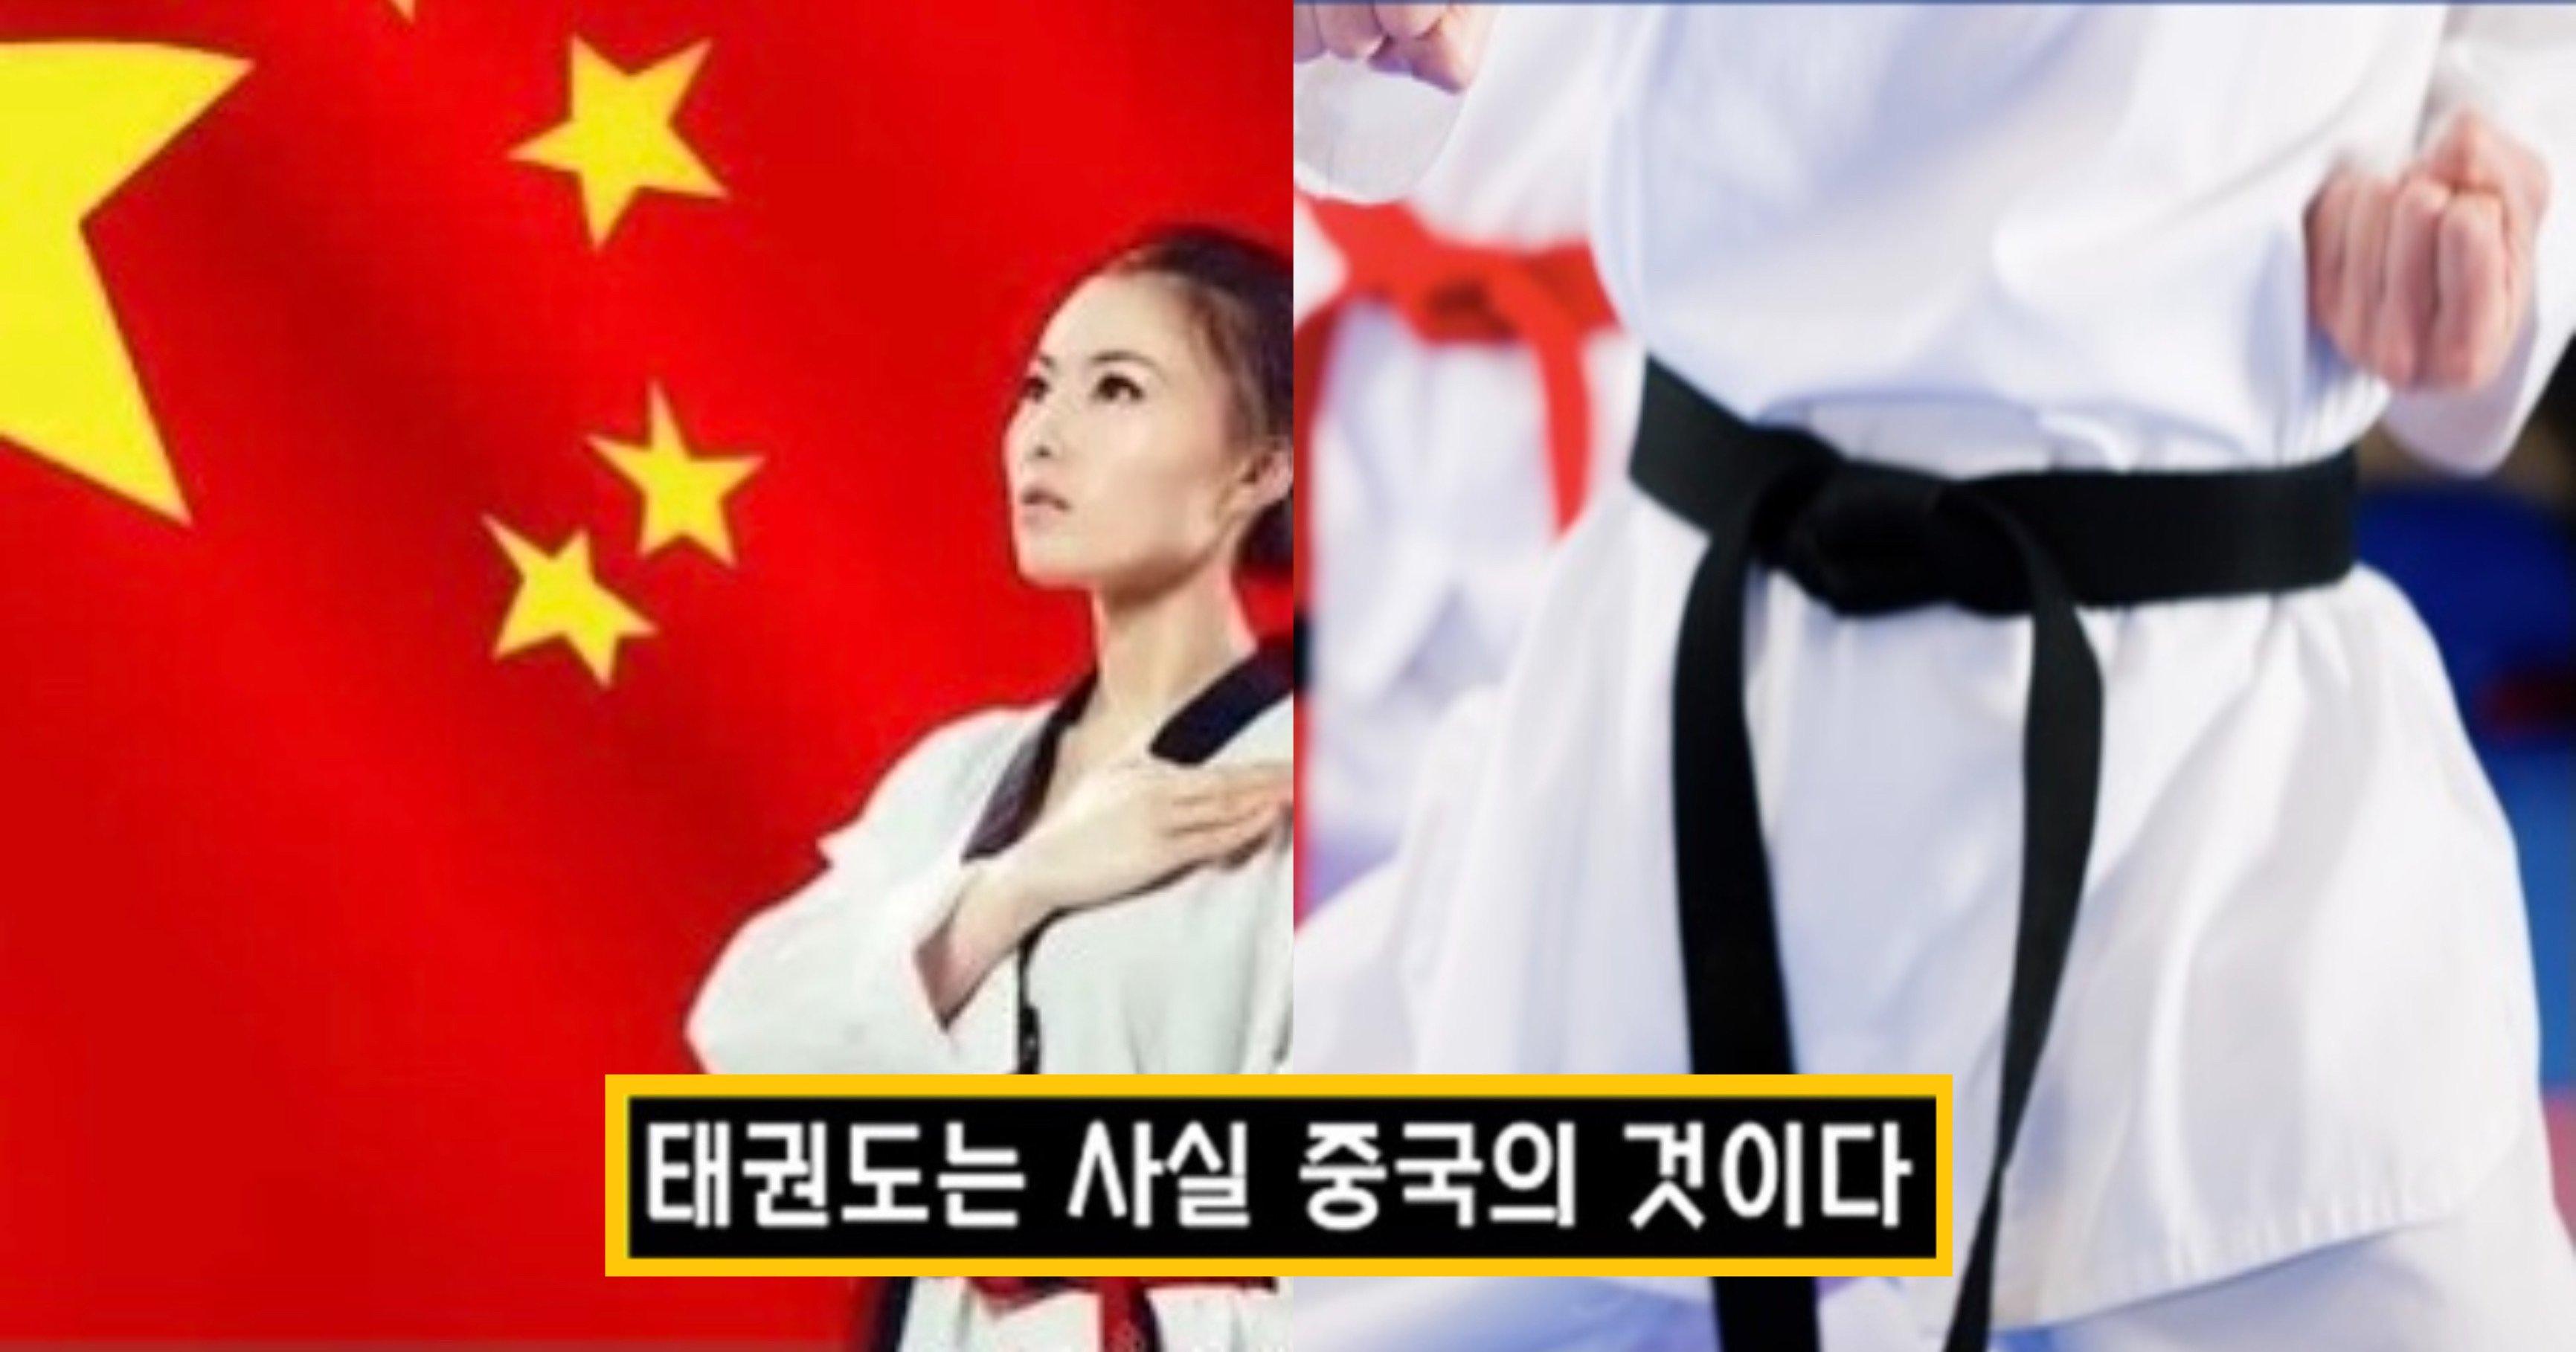 "2d63bd10 b562 44f8 8f3c 7ac960c30859.jpeg?resize=412,232 - ""중국이 한국을 만든 것""..'태권도'를 자국 무술이라고 우기는 중국(영상)"